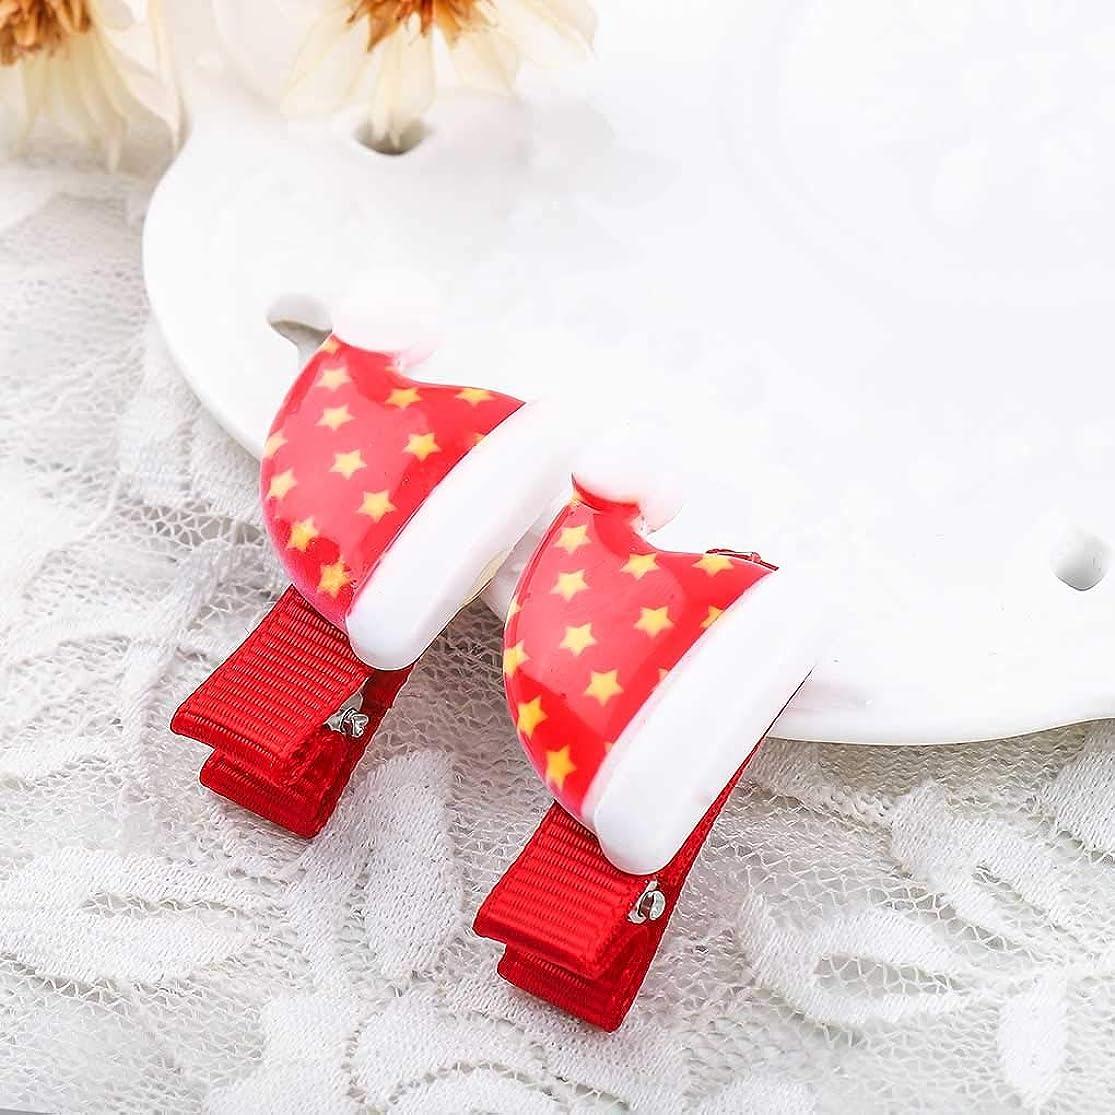 Fstrend Fashion Christmas Hair Clips Festival Hair Accessories Hair Pins for Children (Set of 2) (White) yejrldaf1